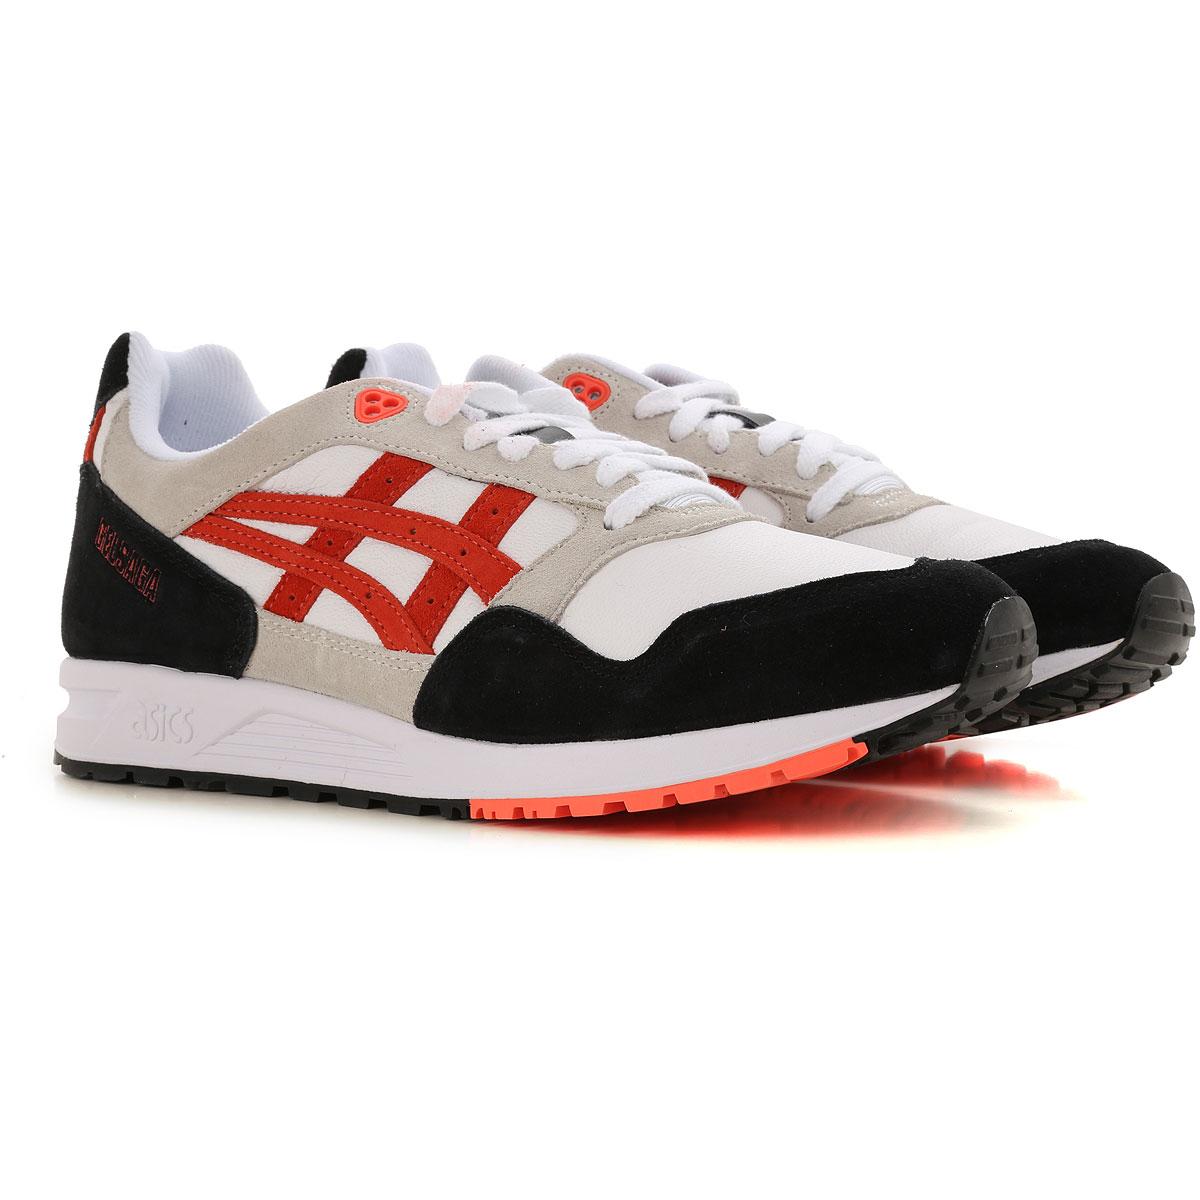 Image of Asics Sneakers for Men, White, Leather, 2017, EUR 41 - US 7 5 US 10 5 - UK 9 5 - EU 44 - JP 28 EUR 40.5 - US 7.5 - UK 6.5 EUR 43 - UK 9 - USA 9.5 UK 10 - EUR 44 - US 11 UK 11 - EUR 45 - US 12 EUR 42 - US 9 - UK 8